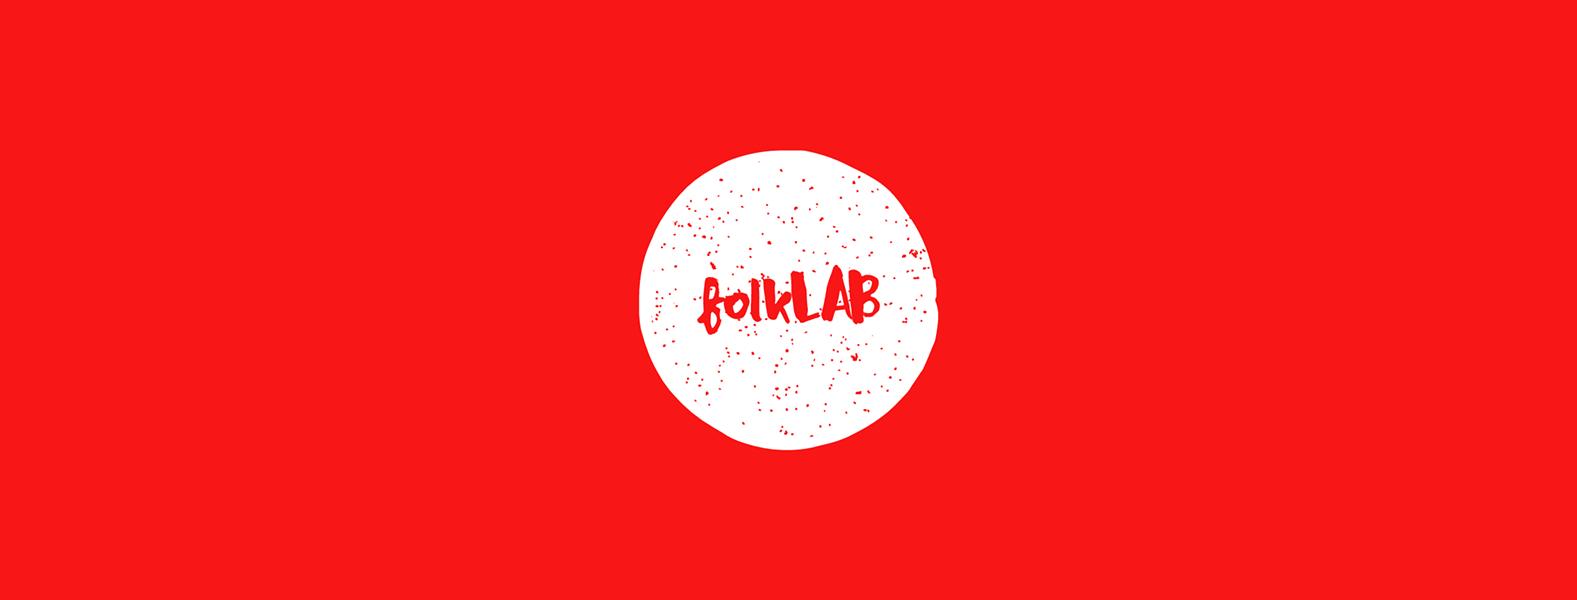 folklab.png